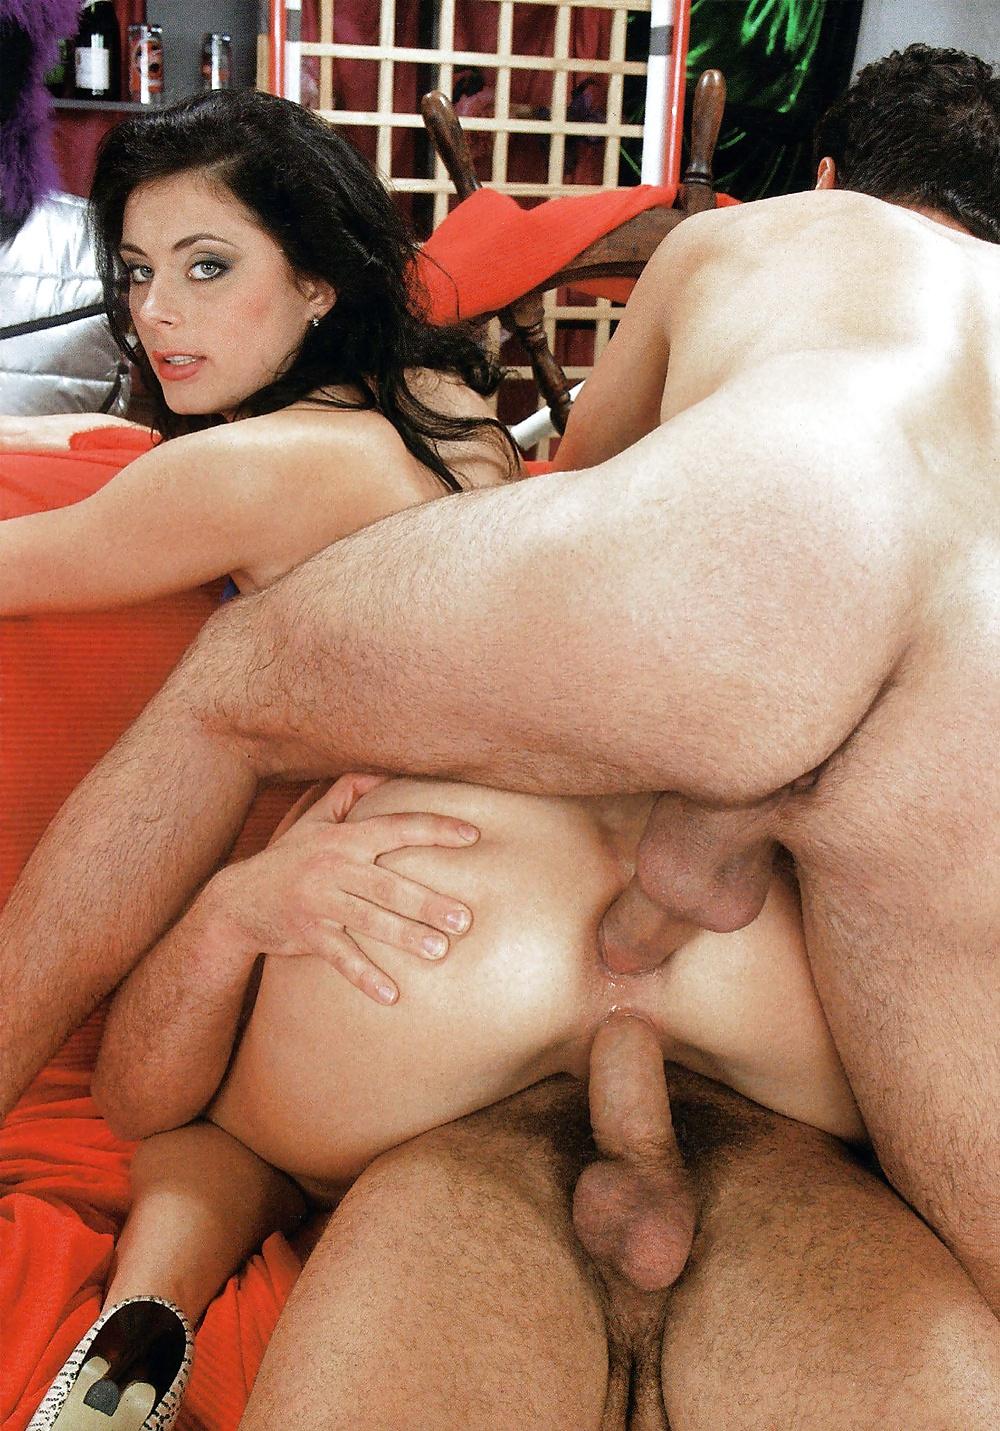 penetrating-nude-women